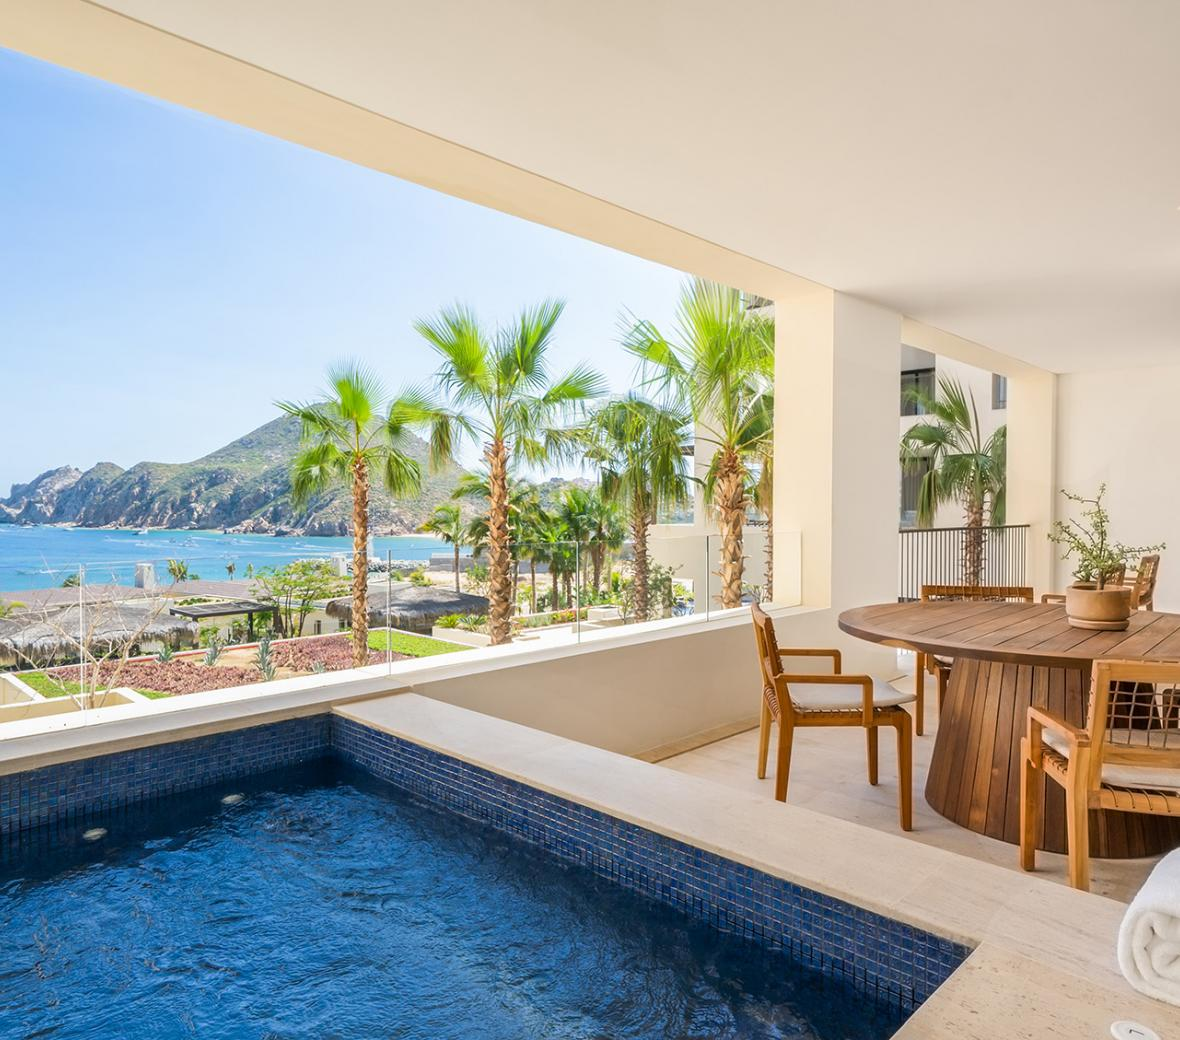 Three Bedroom Ocean View Home Terrace